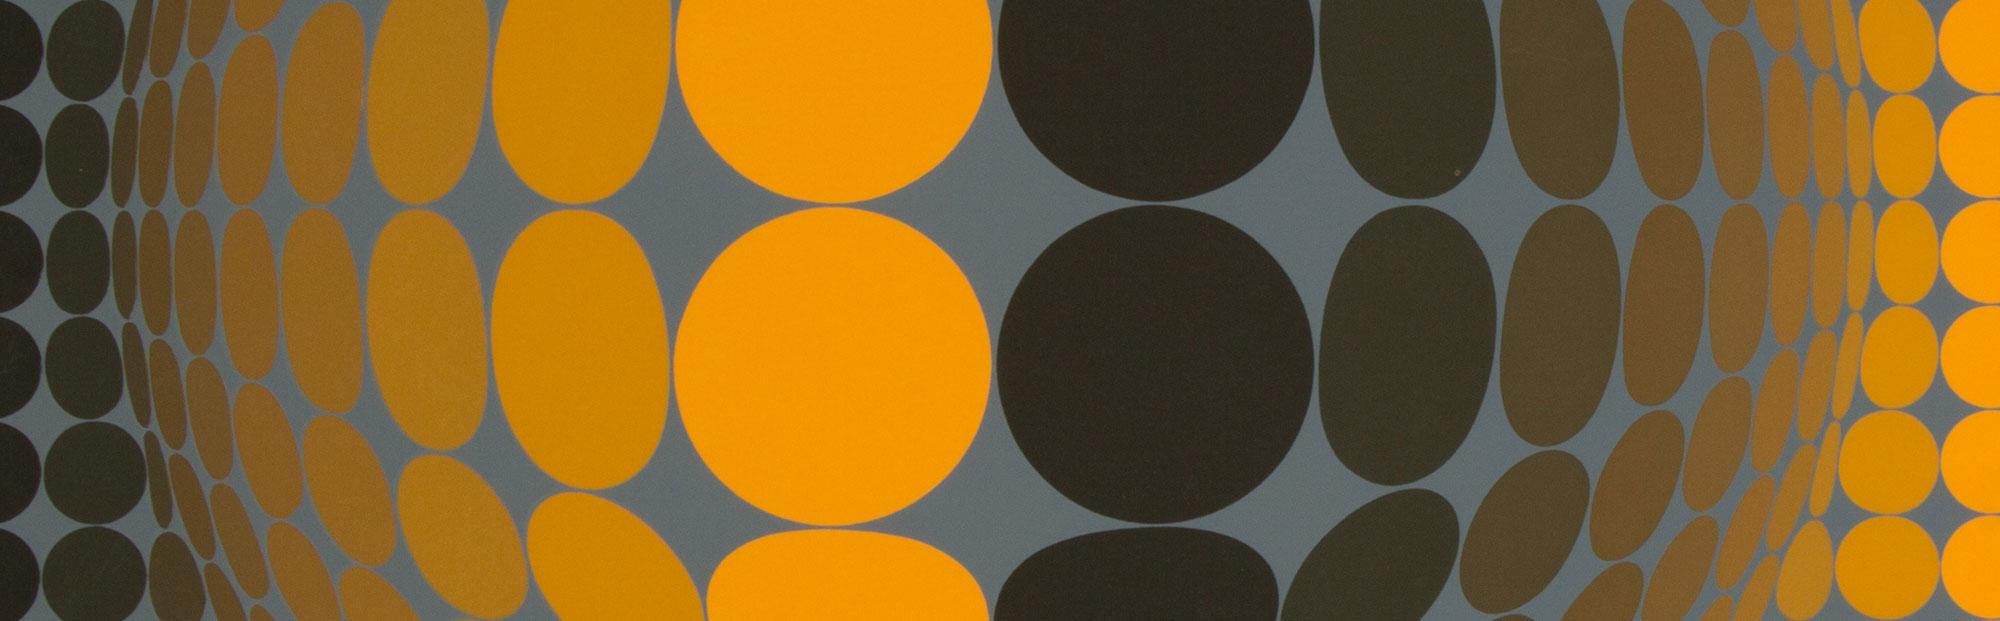 iGavel Interiors:  February Sale of Art and Home Furnishings